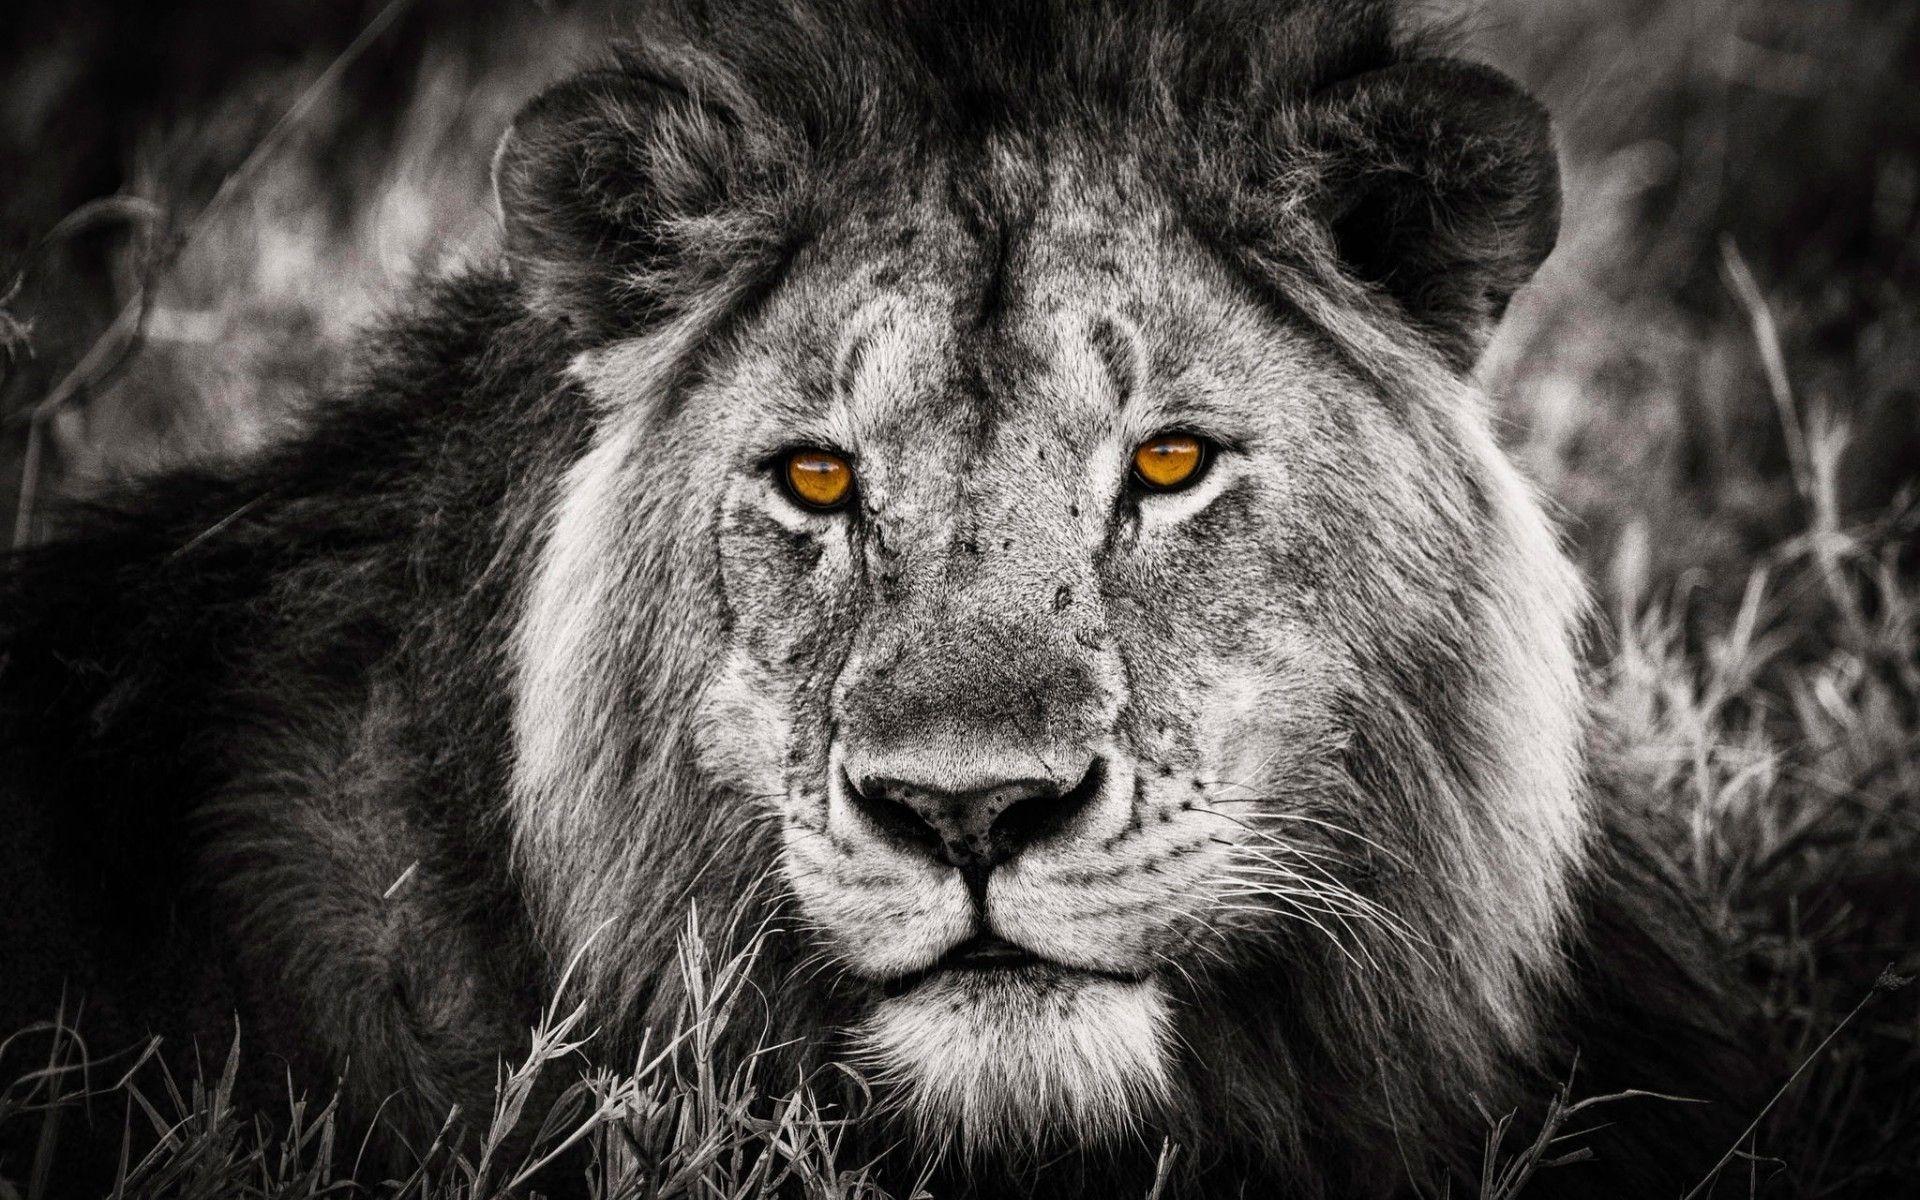 Lion Black And White Animal download nice wallpaper